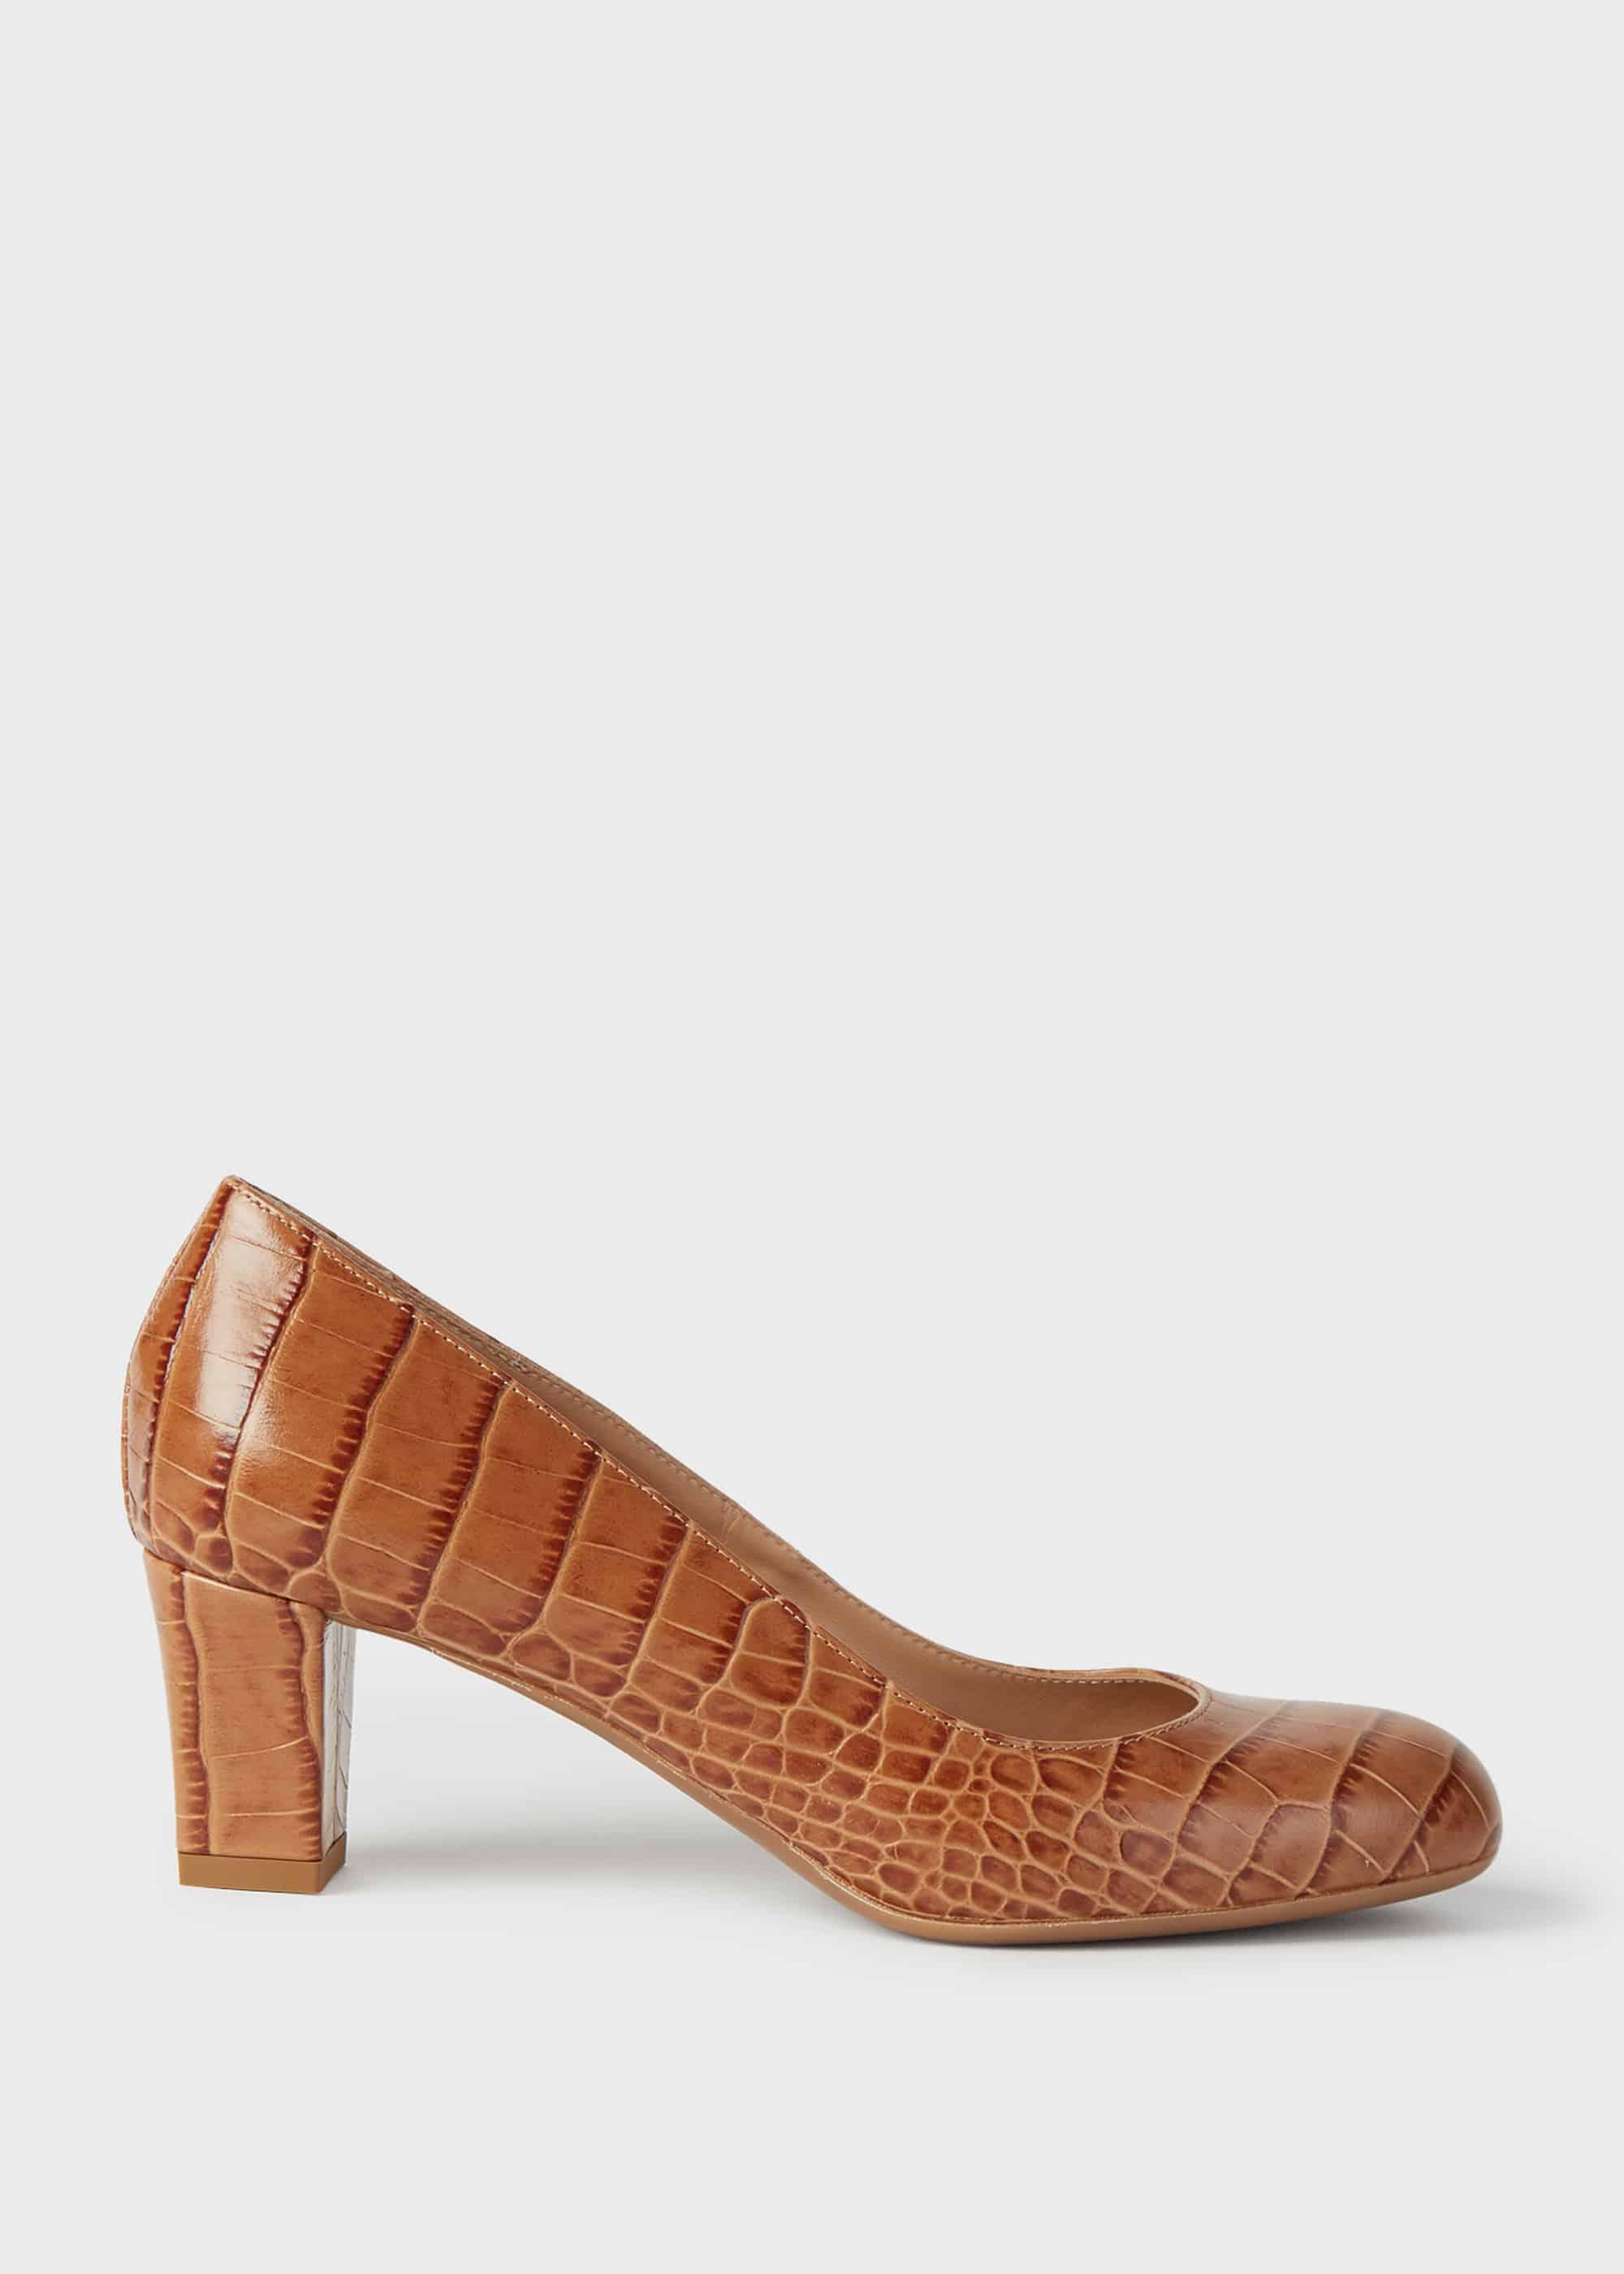 Hobbs Women Amber Crocodile Print Block Heel Court Shoes